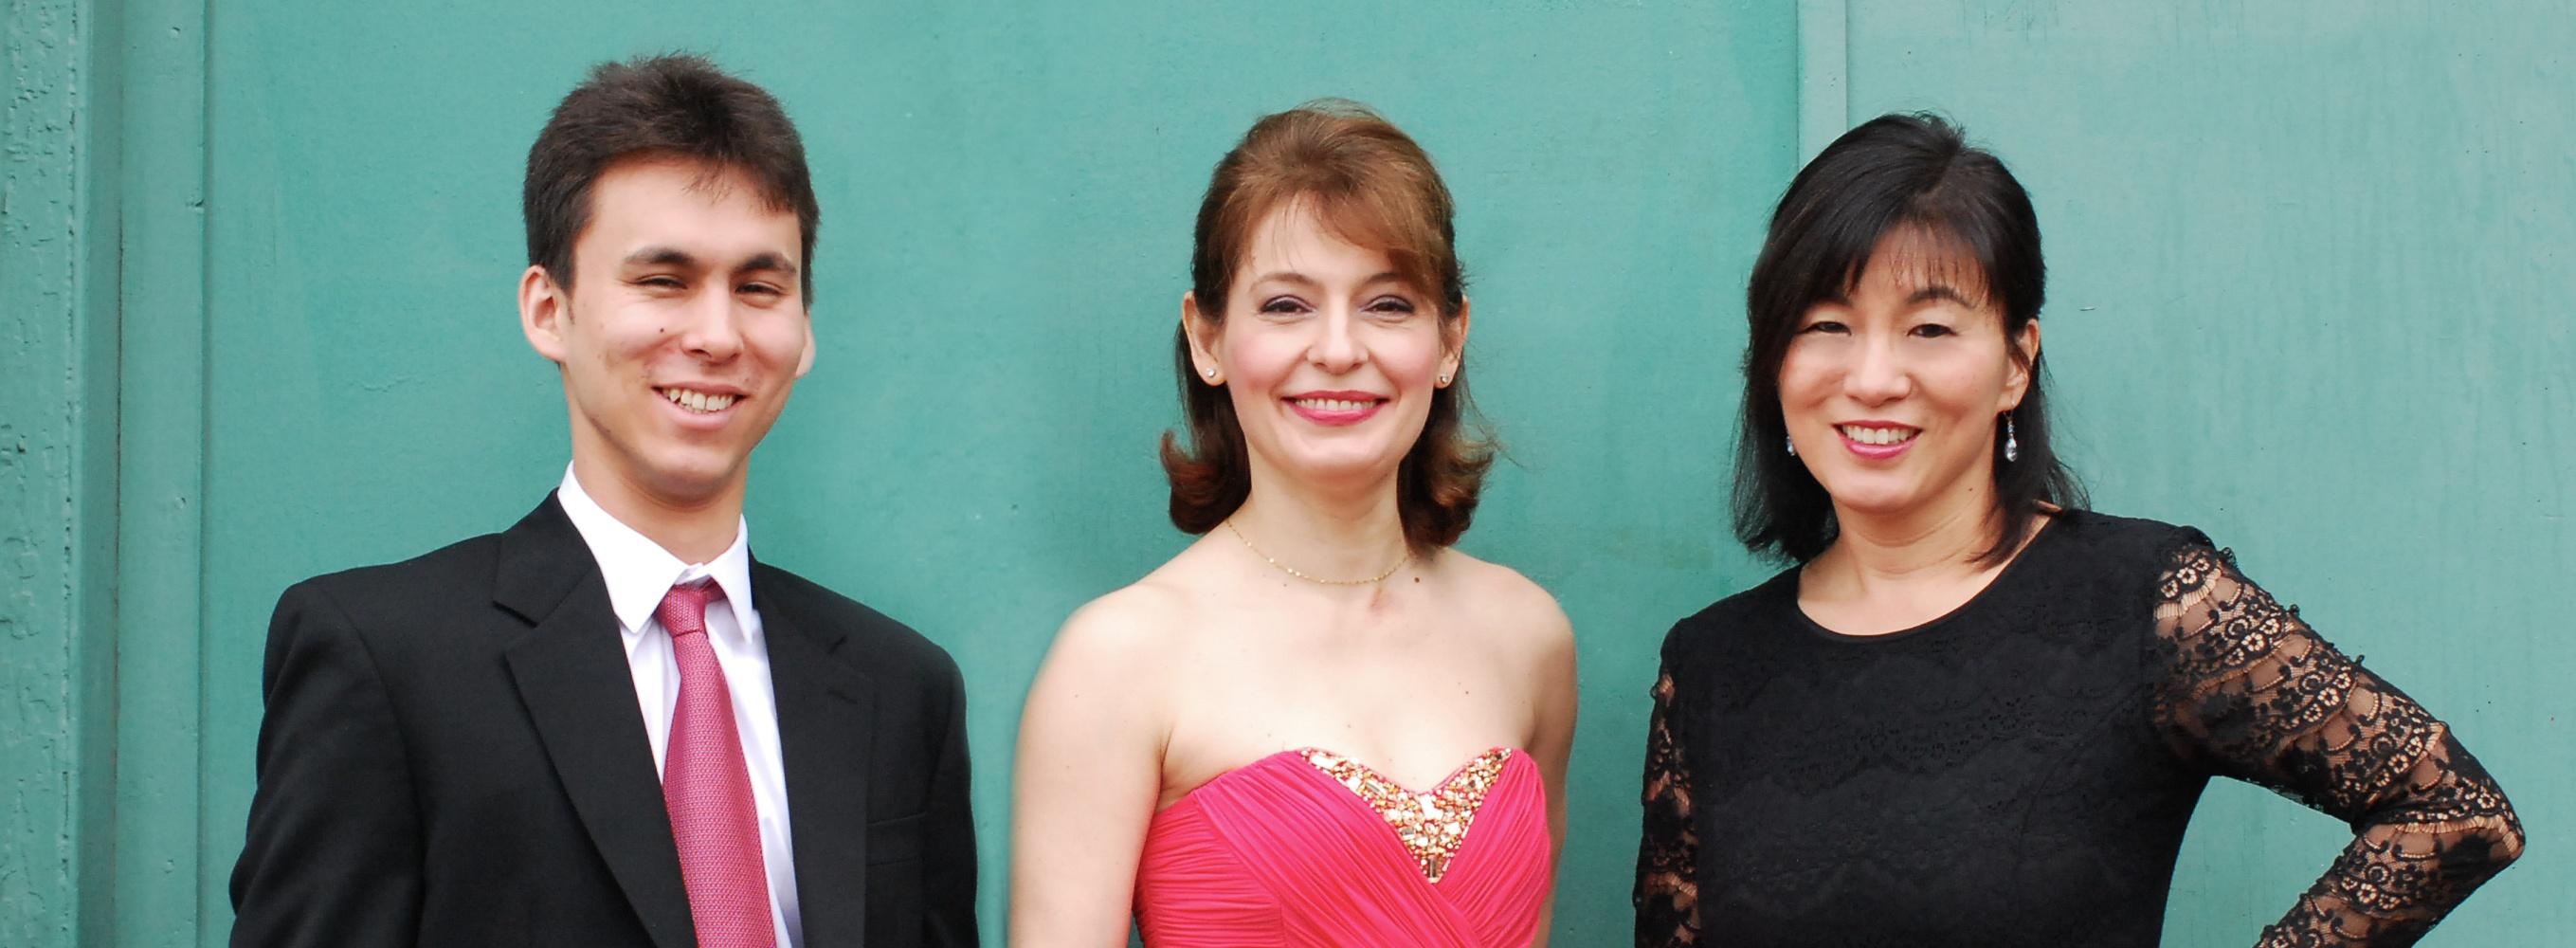 The trio.  Via Boston Philharmonic Orchestra.